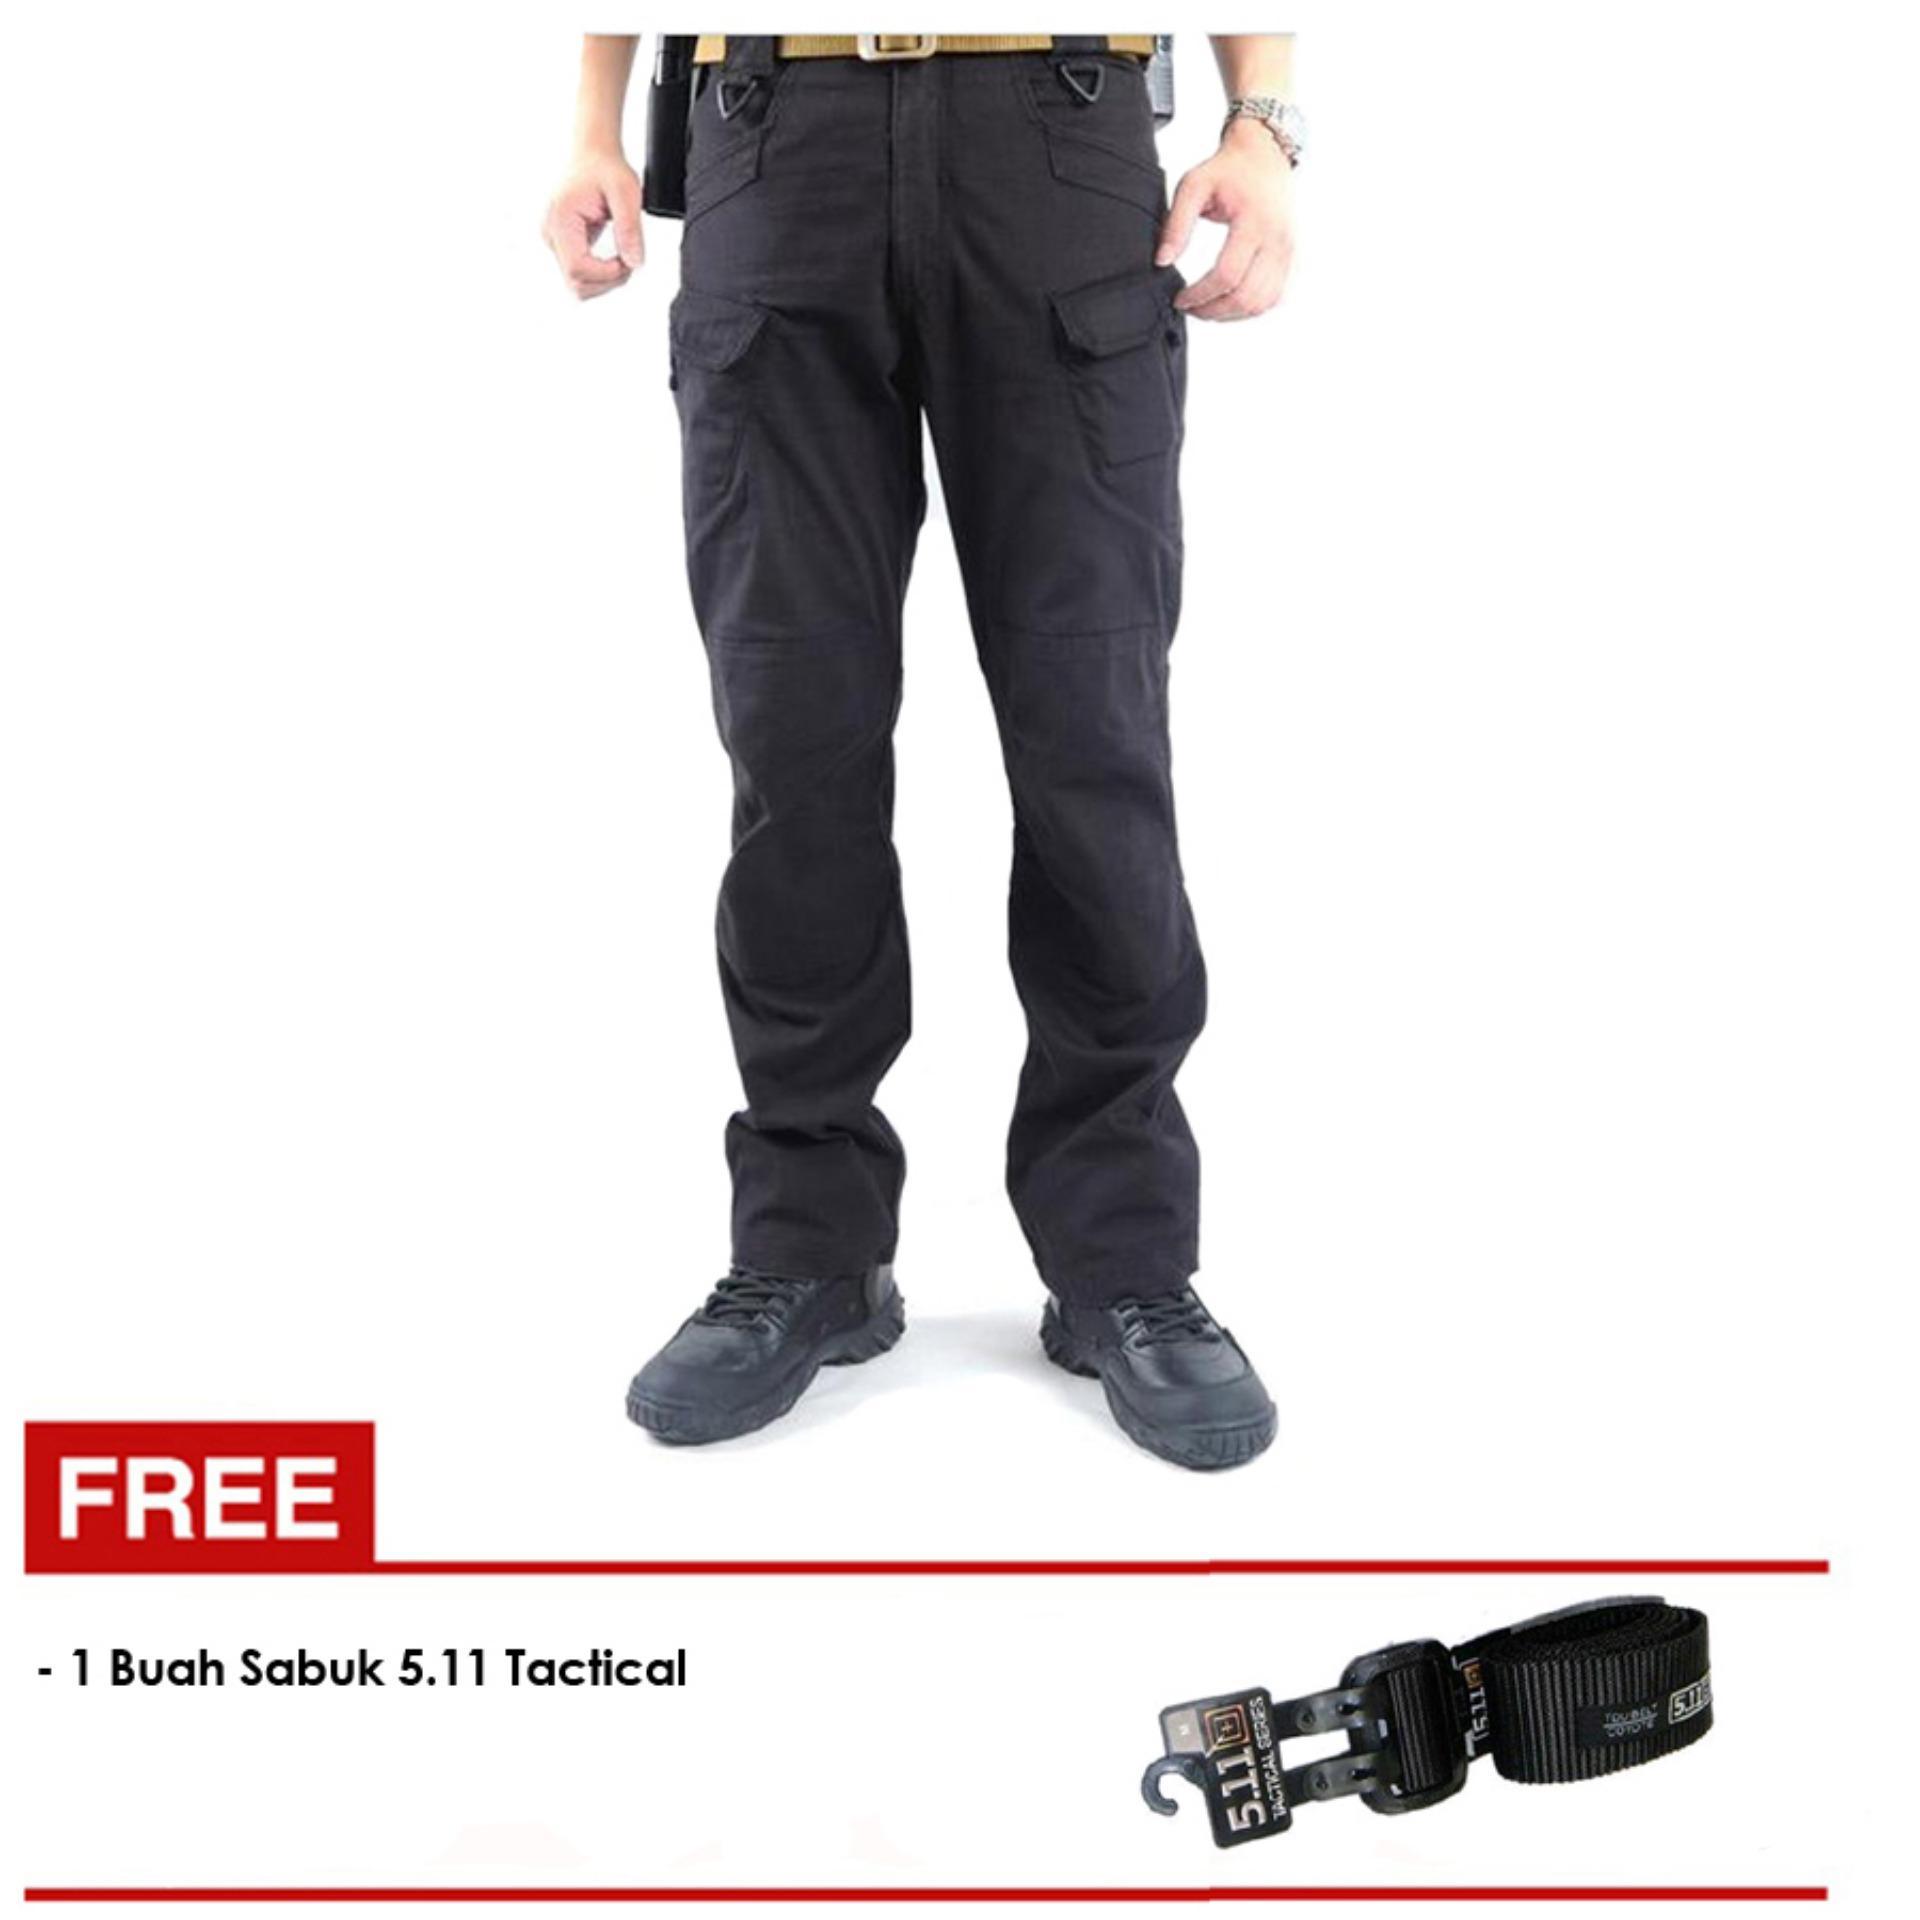 Diskon Harga Sabuk Celana Terbaru Murah Bulan Oktober 2018 Gg Fashion Tactical Outdoor Blackhawk Pria Hitam 511 Belt